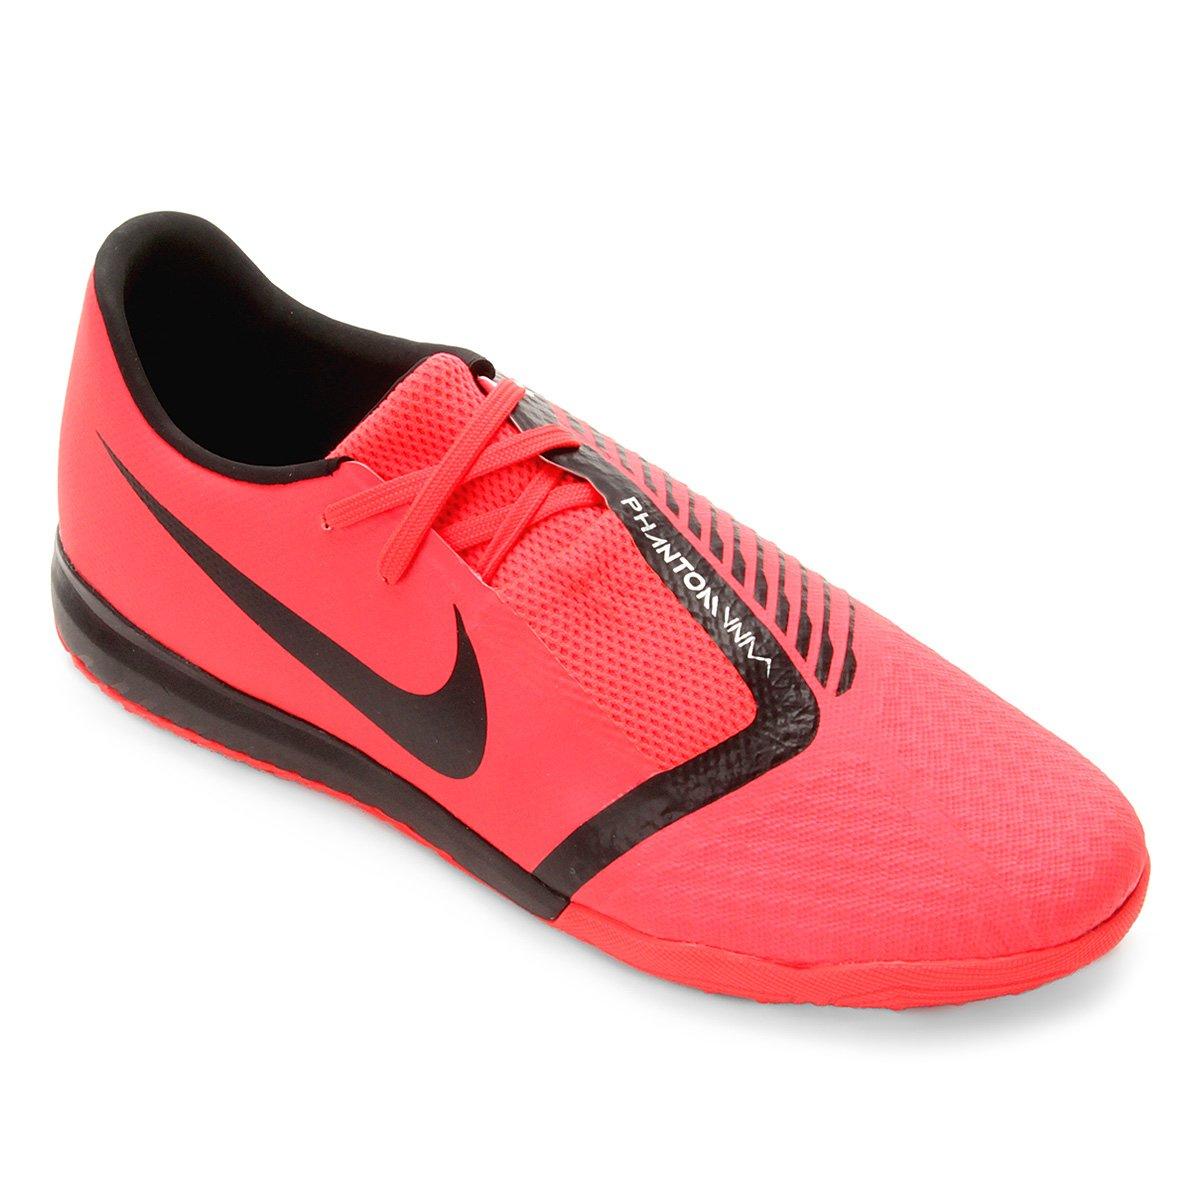 Chuteira Society Nike Phantom Venom Academy TF - Vermelho e Preto - Compre  Agora  656356a0bdc